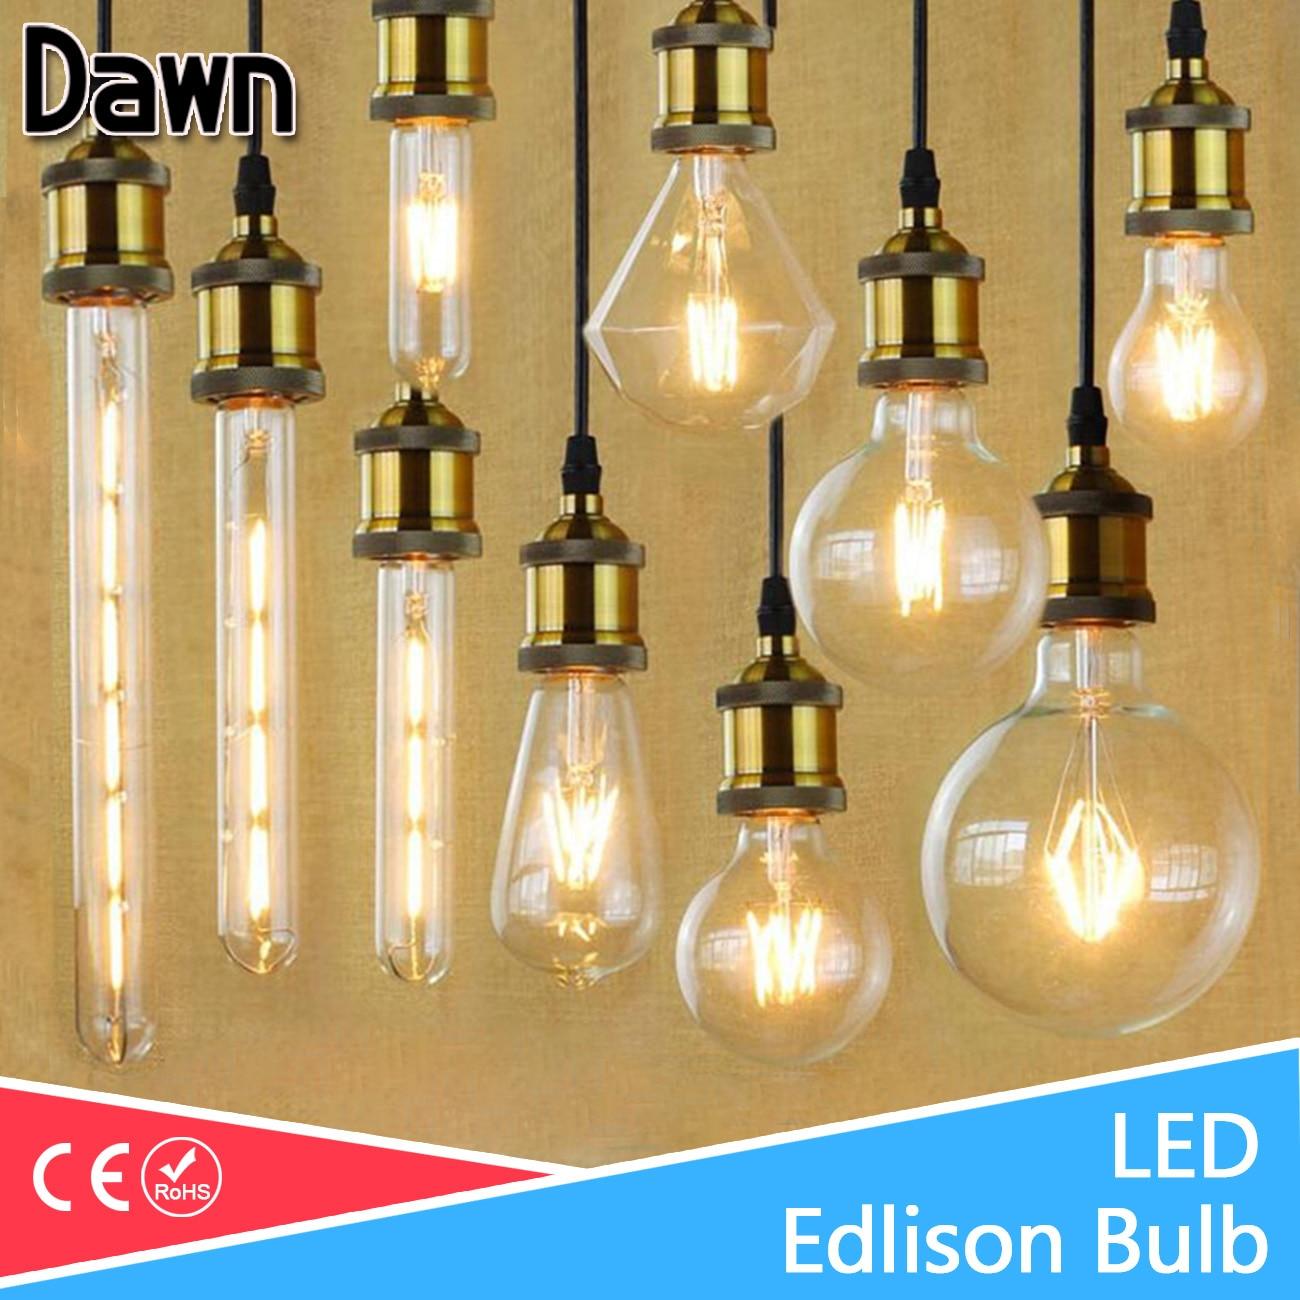 Lampada LED Filament Glass Light Edison Blub Lamps 220V LED Edison chandelier E14 E27 240V Vintage Led Bulb 2W 4W 6W 8W 12W 1x new design led filament e14 bulb dmimable 2w 4w 6w ac 220v 230v lamp edison glass candle lights lighting for chandelier